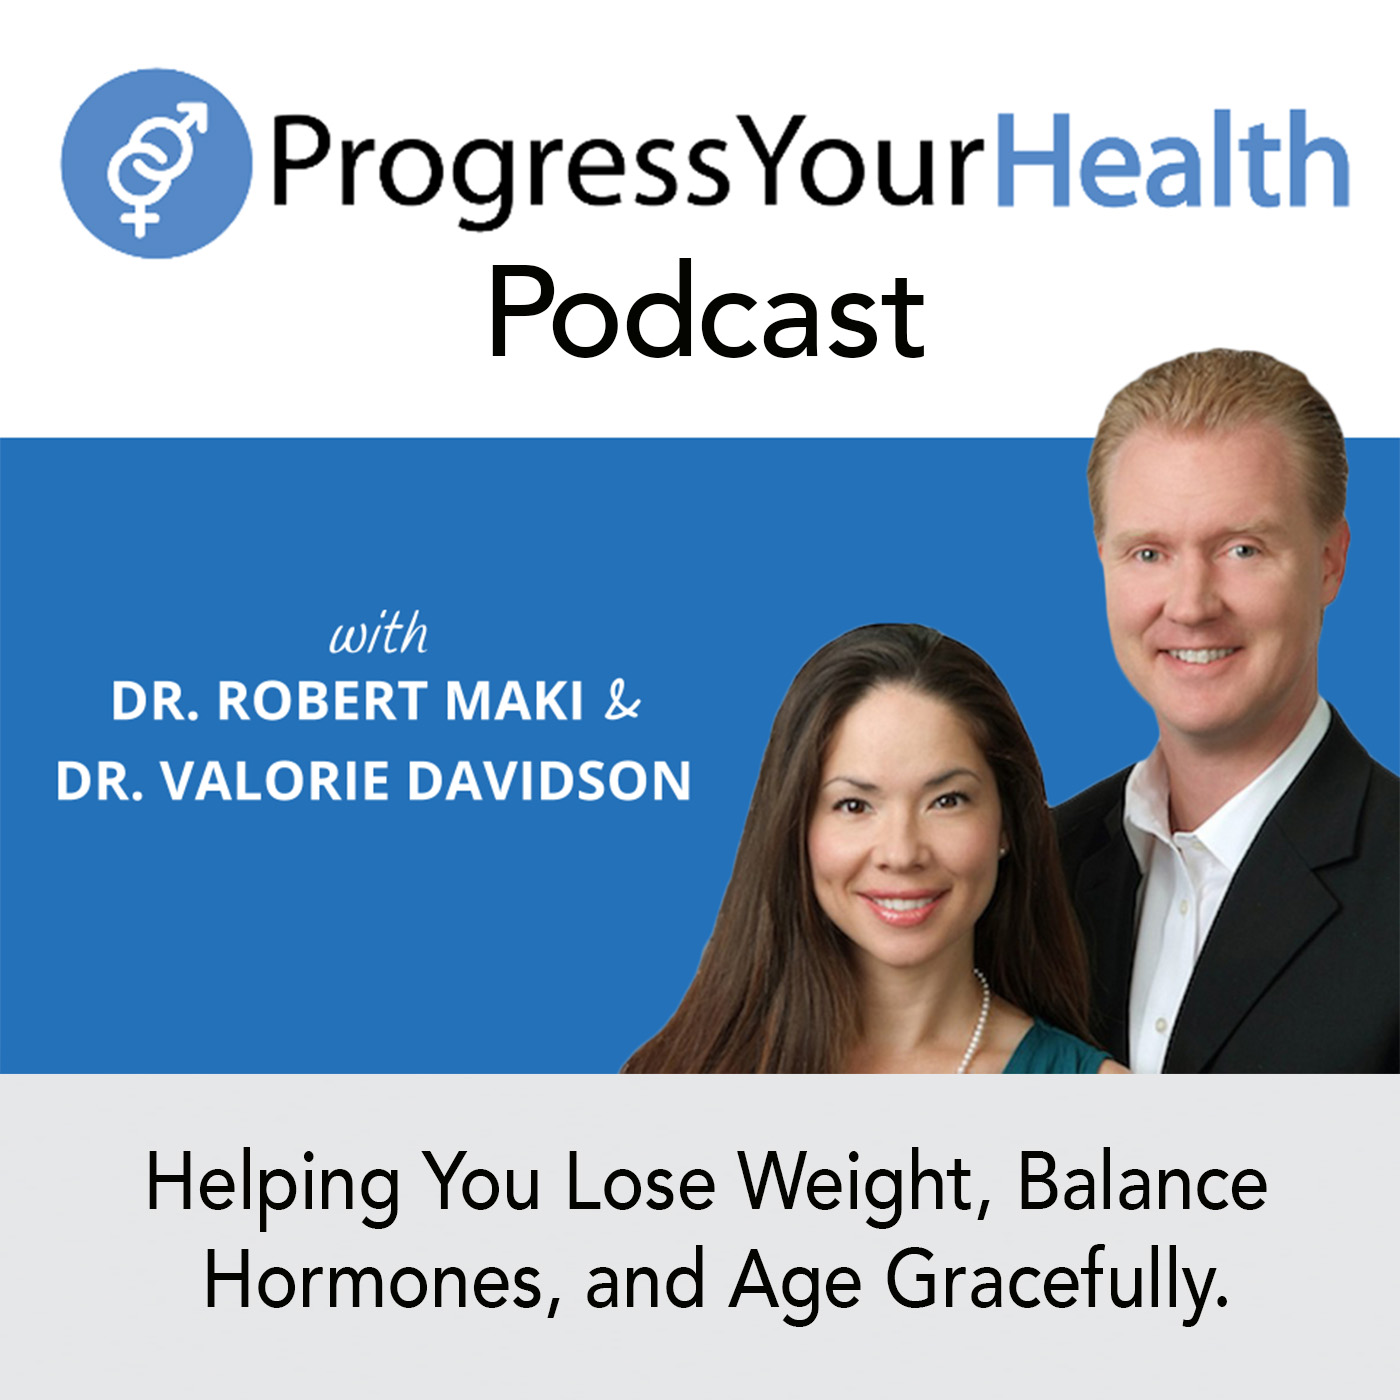 Progress Your Health Podcast